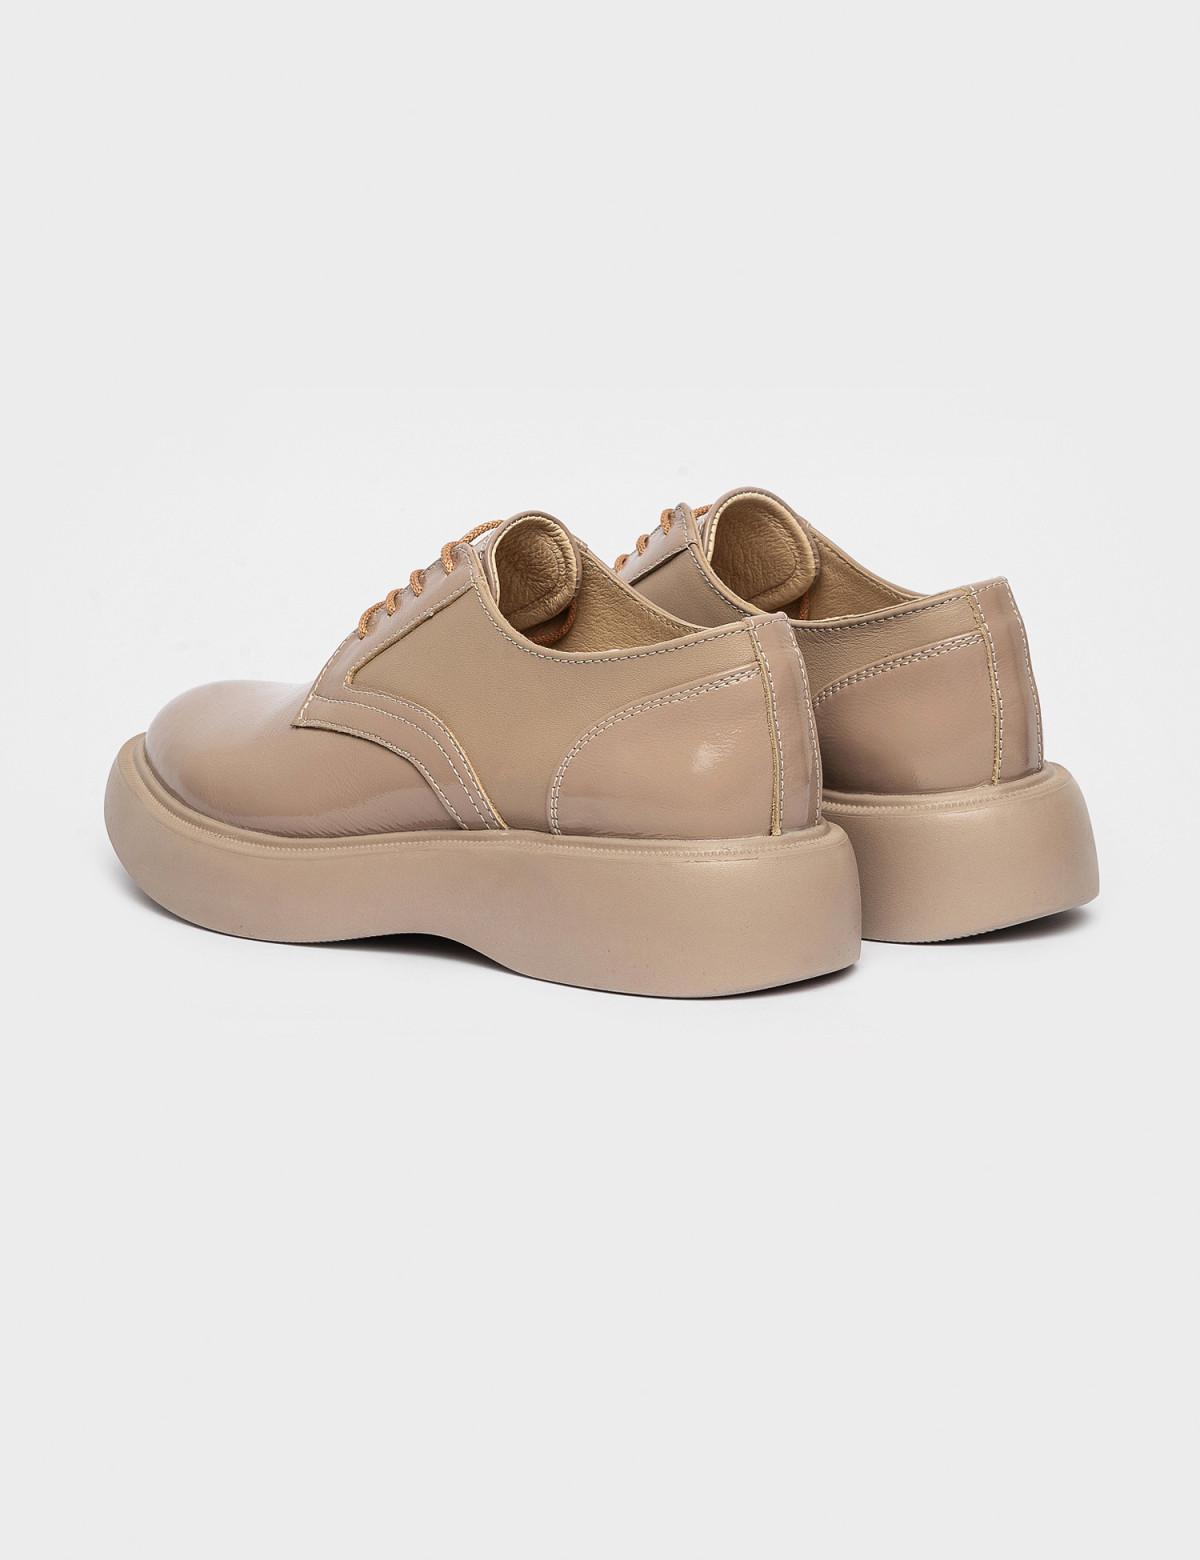 Туфлі бежеві. Натуральна шкіра2